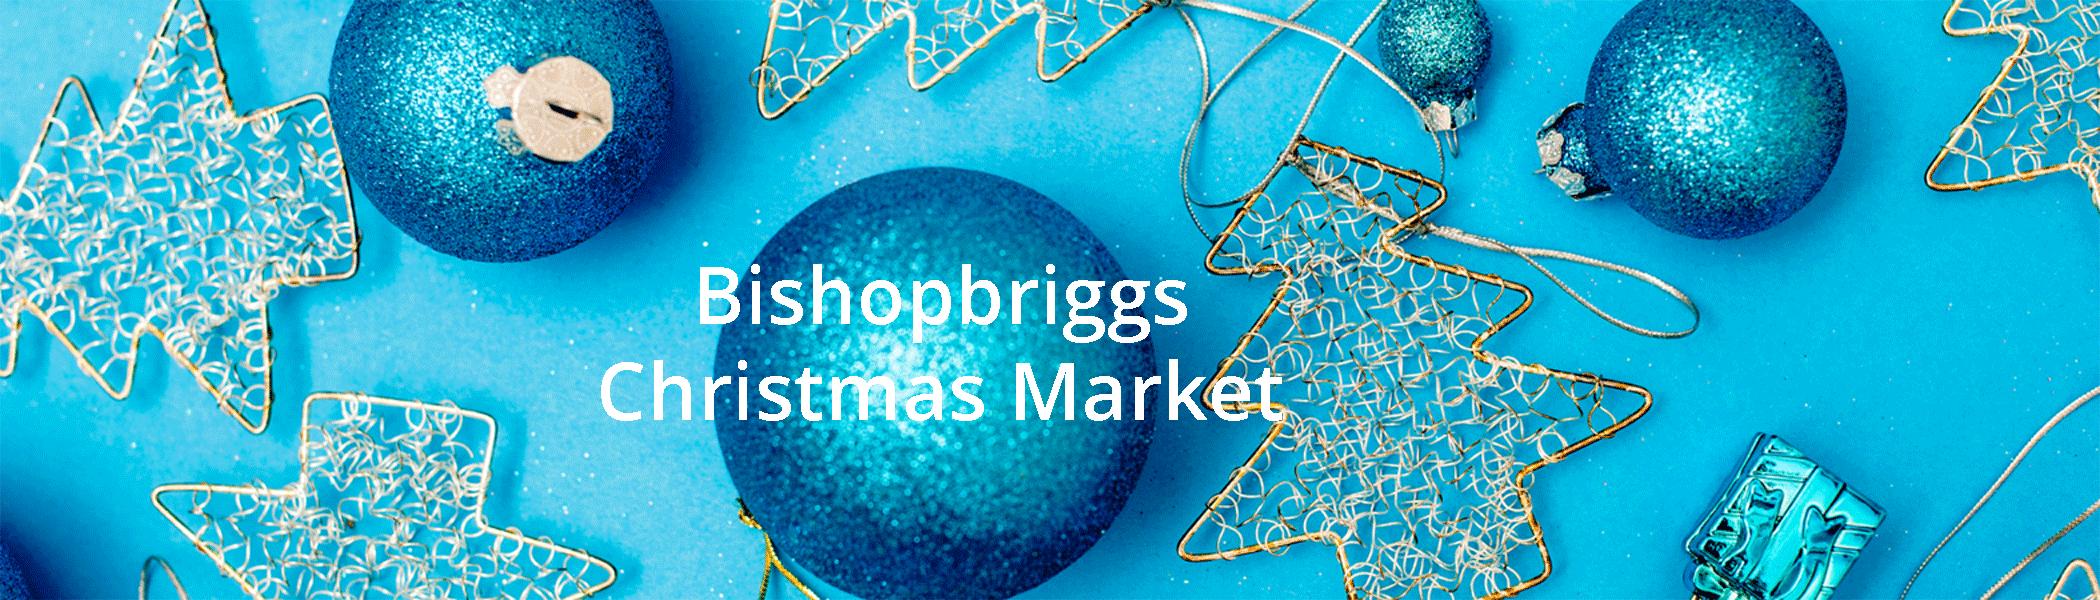 News Bishopbriggs Christmas market 2020